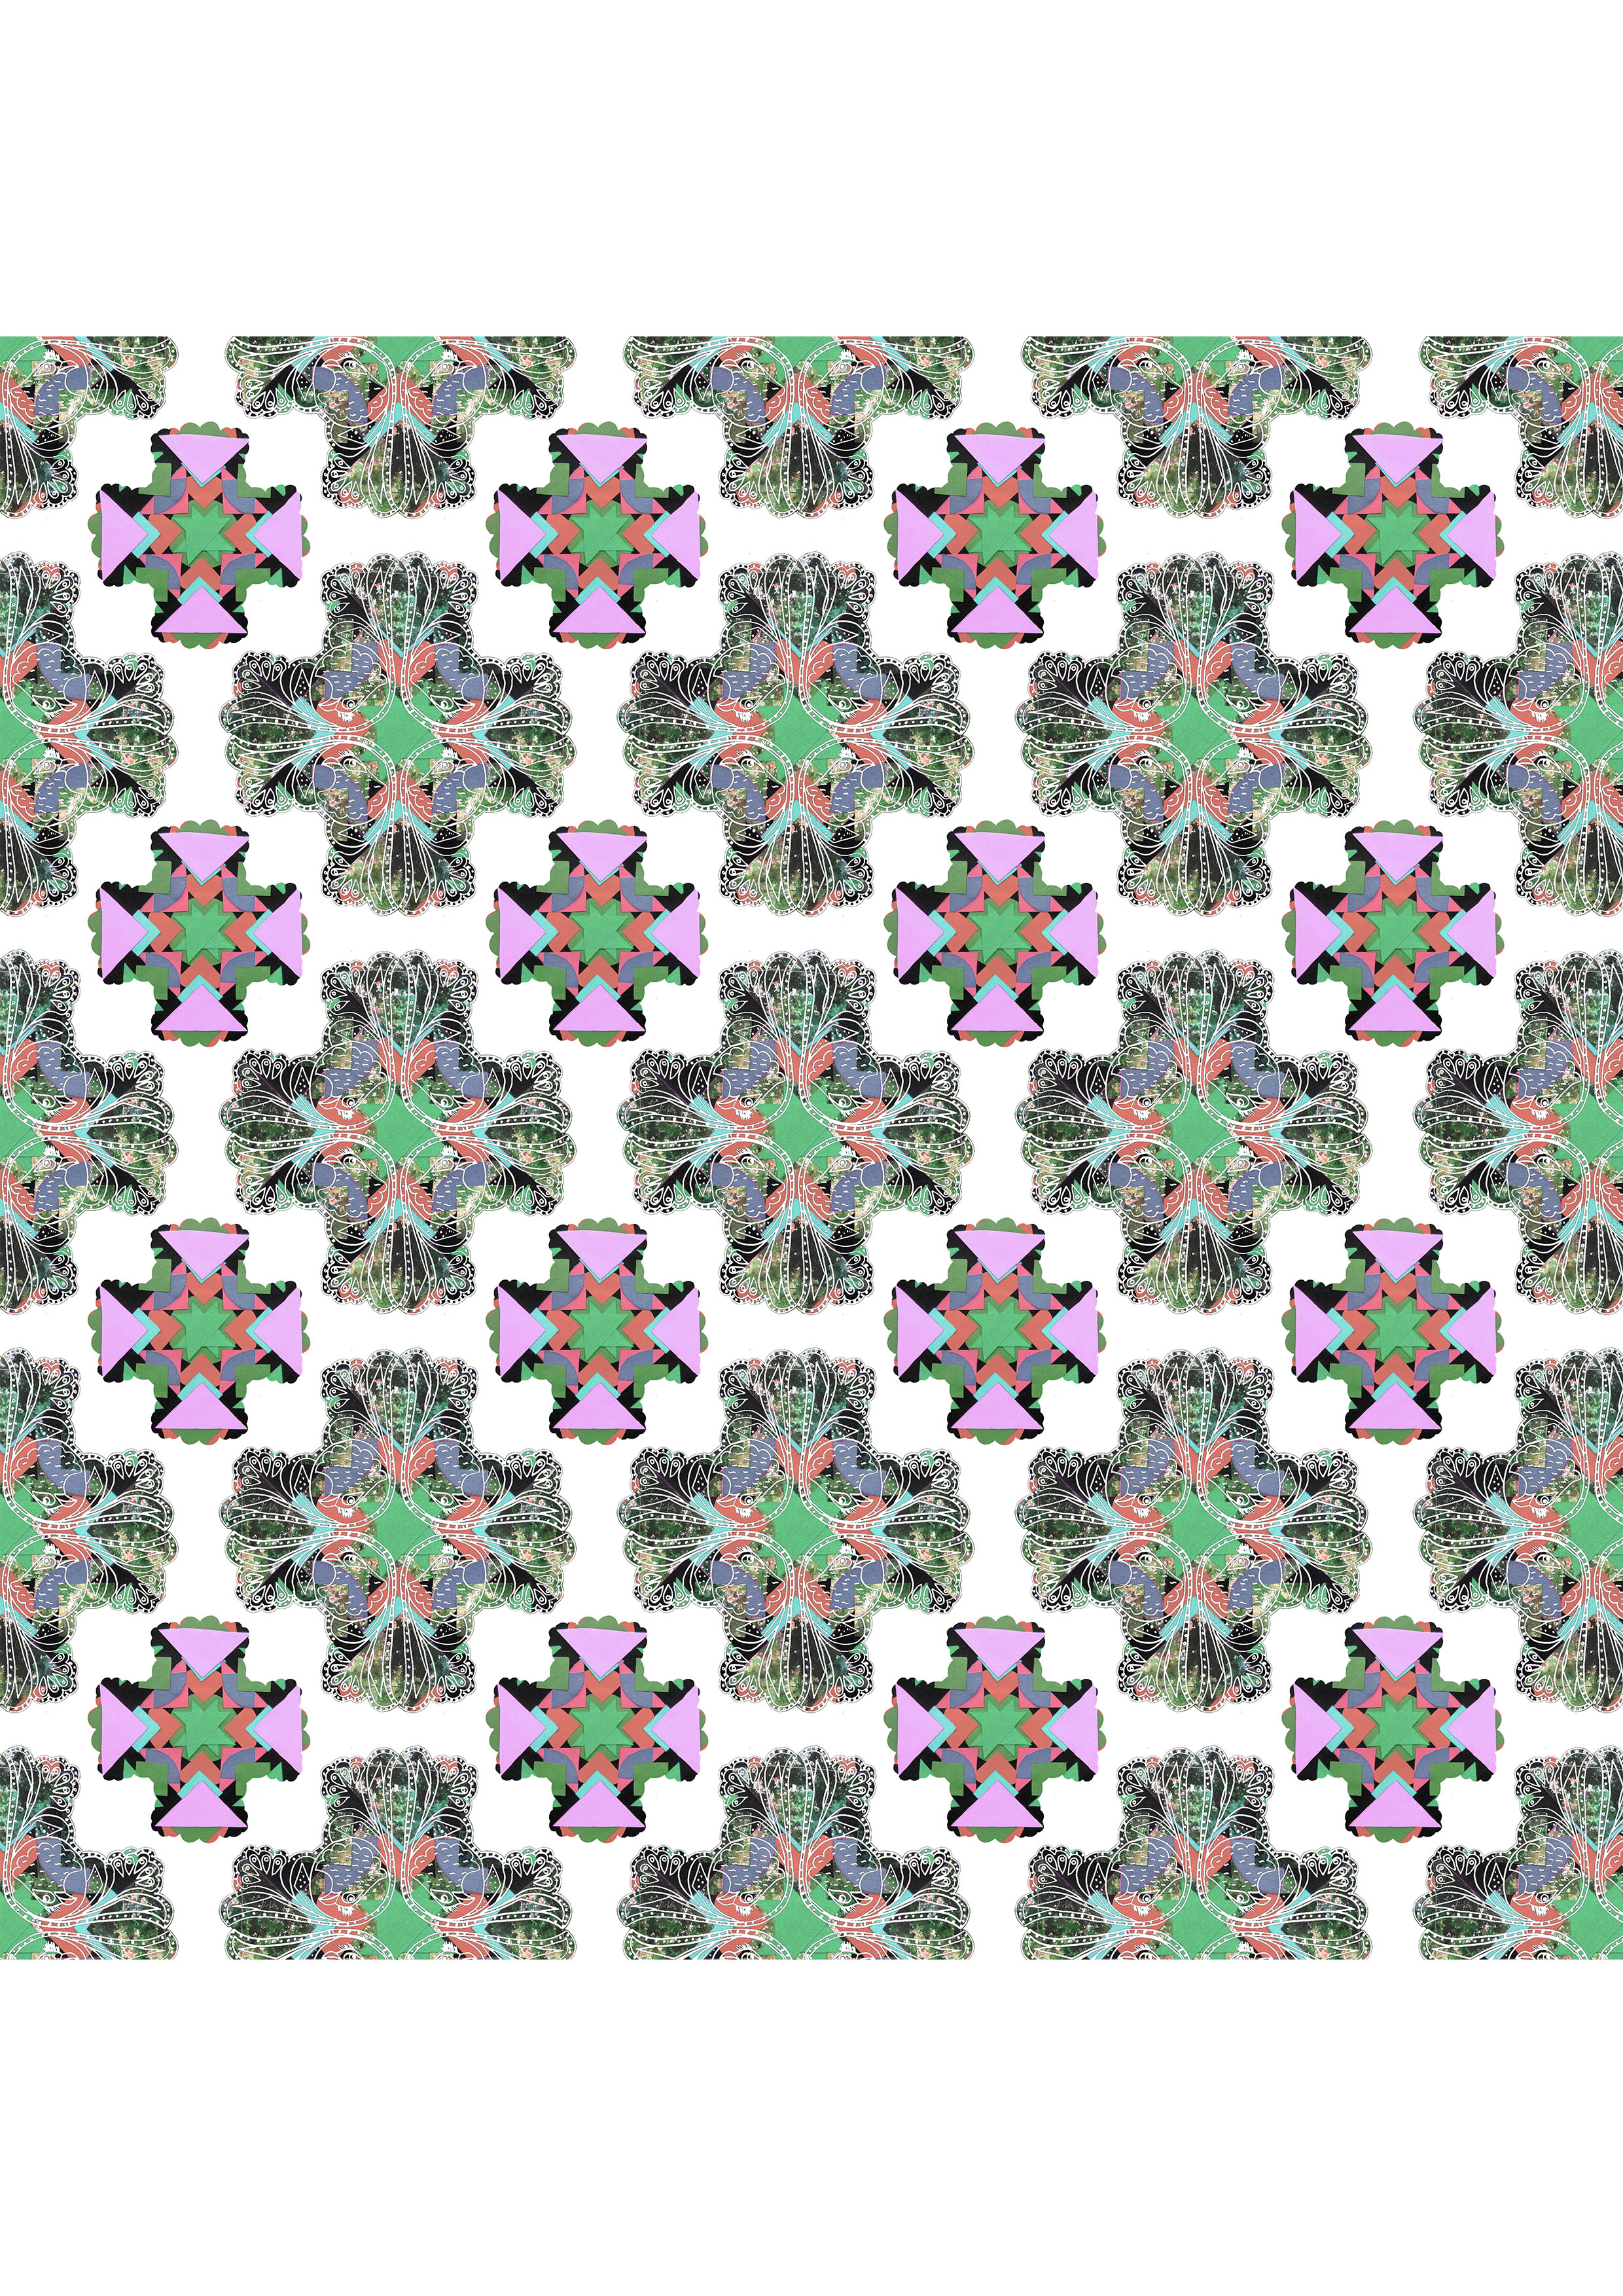 Untitled-2_0008_1 copy.jpg